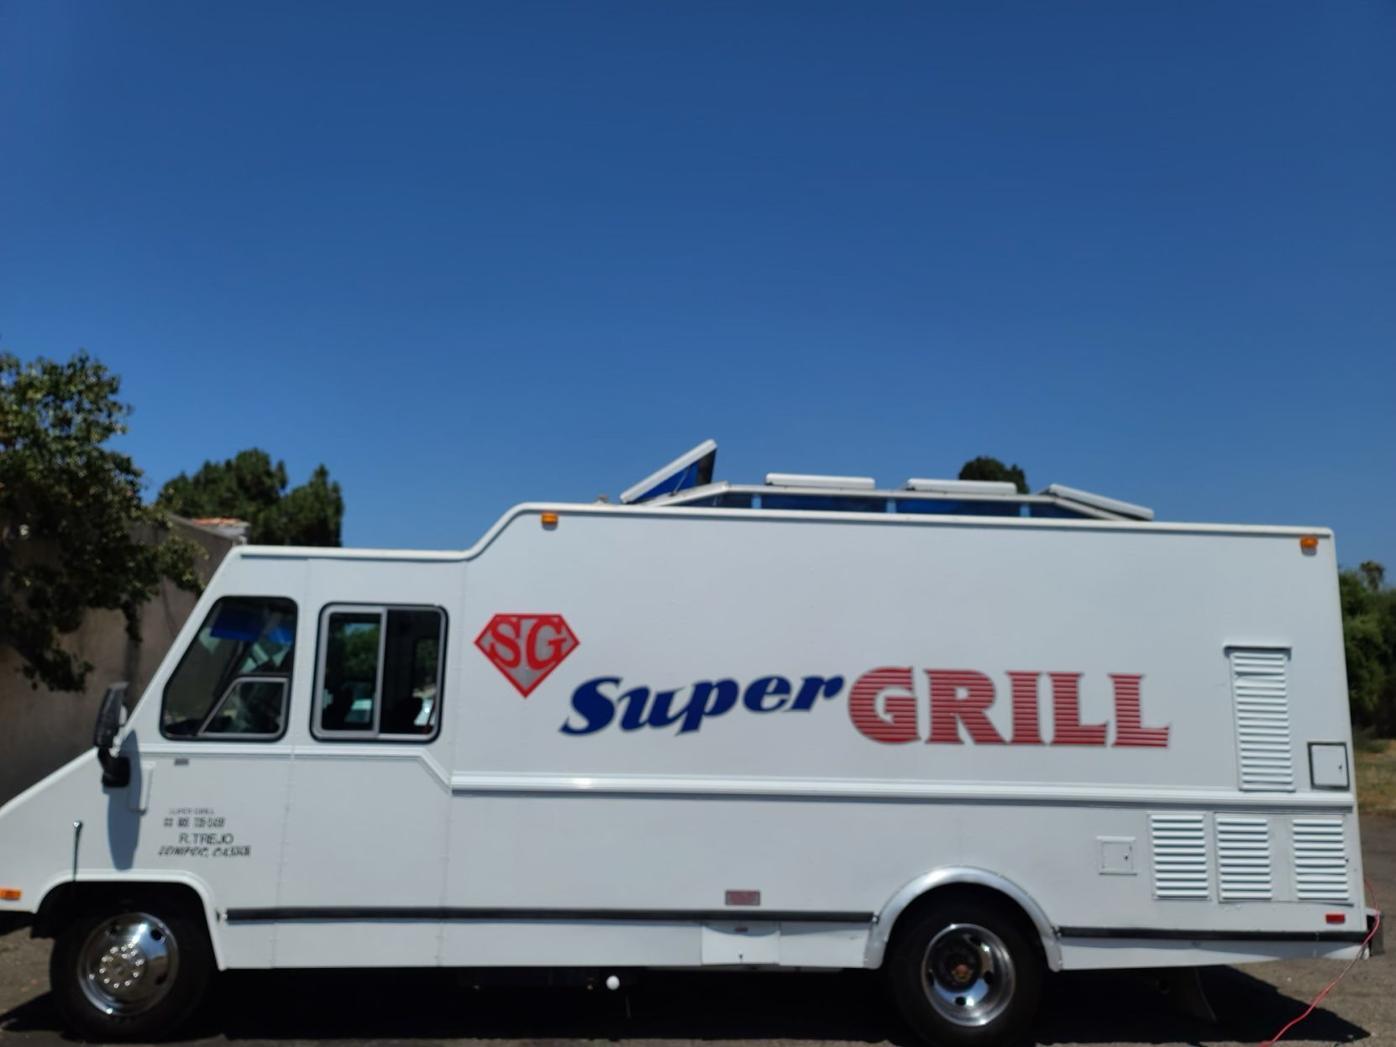 083021 Super Grill 1.jpg